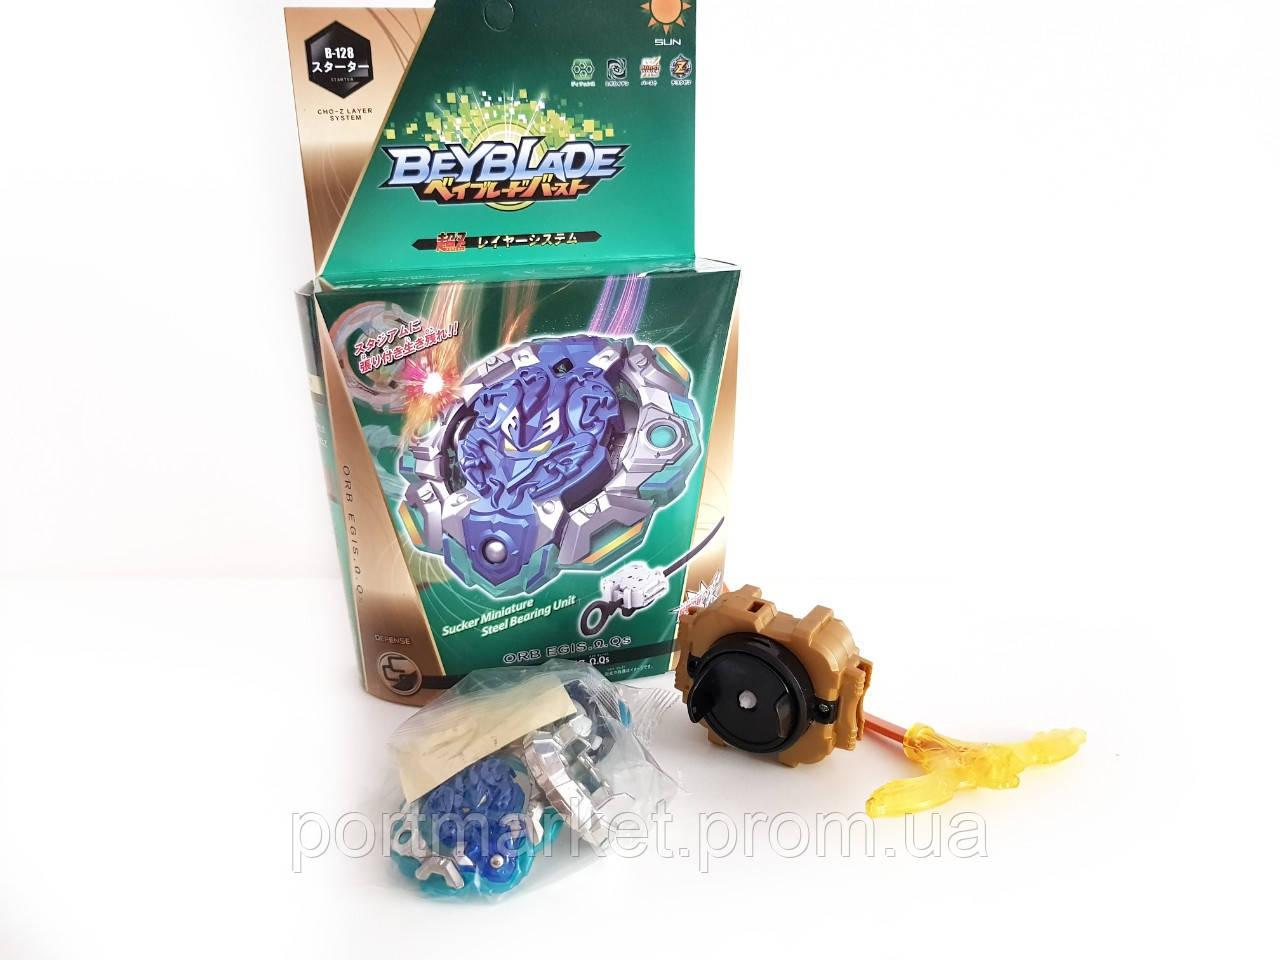 Бейблейд Орб Эгис S 5 сезон Beyblade Orb Egis Outer Quest B-128 Бей Блейд Бэй